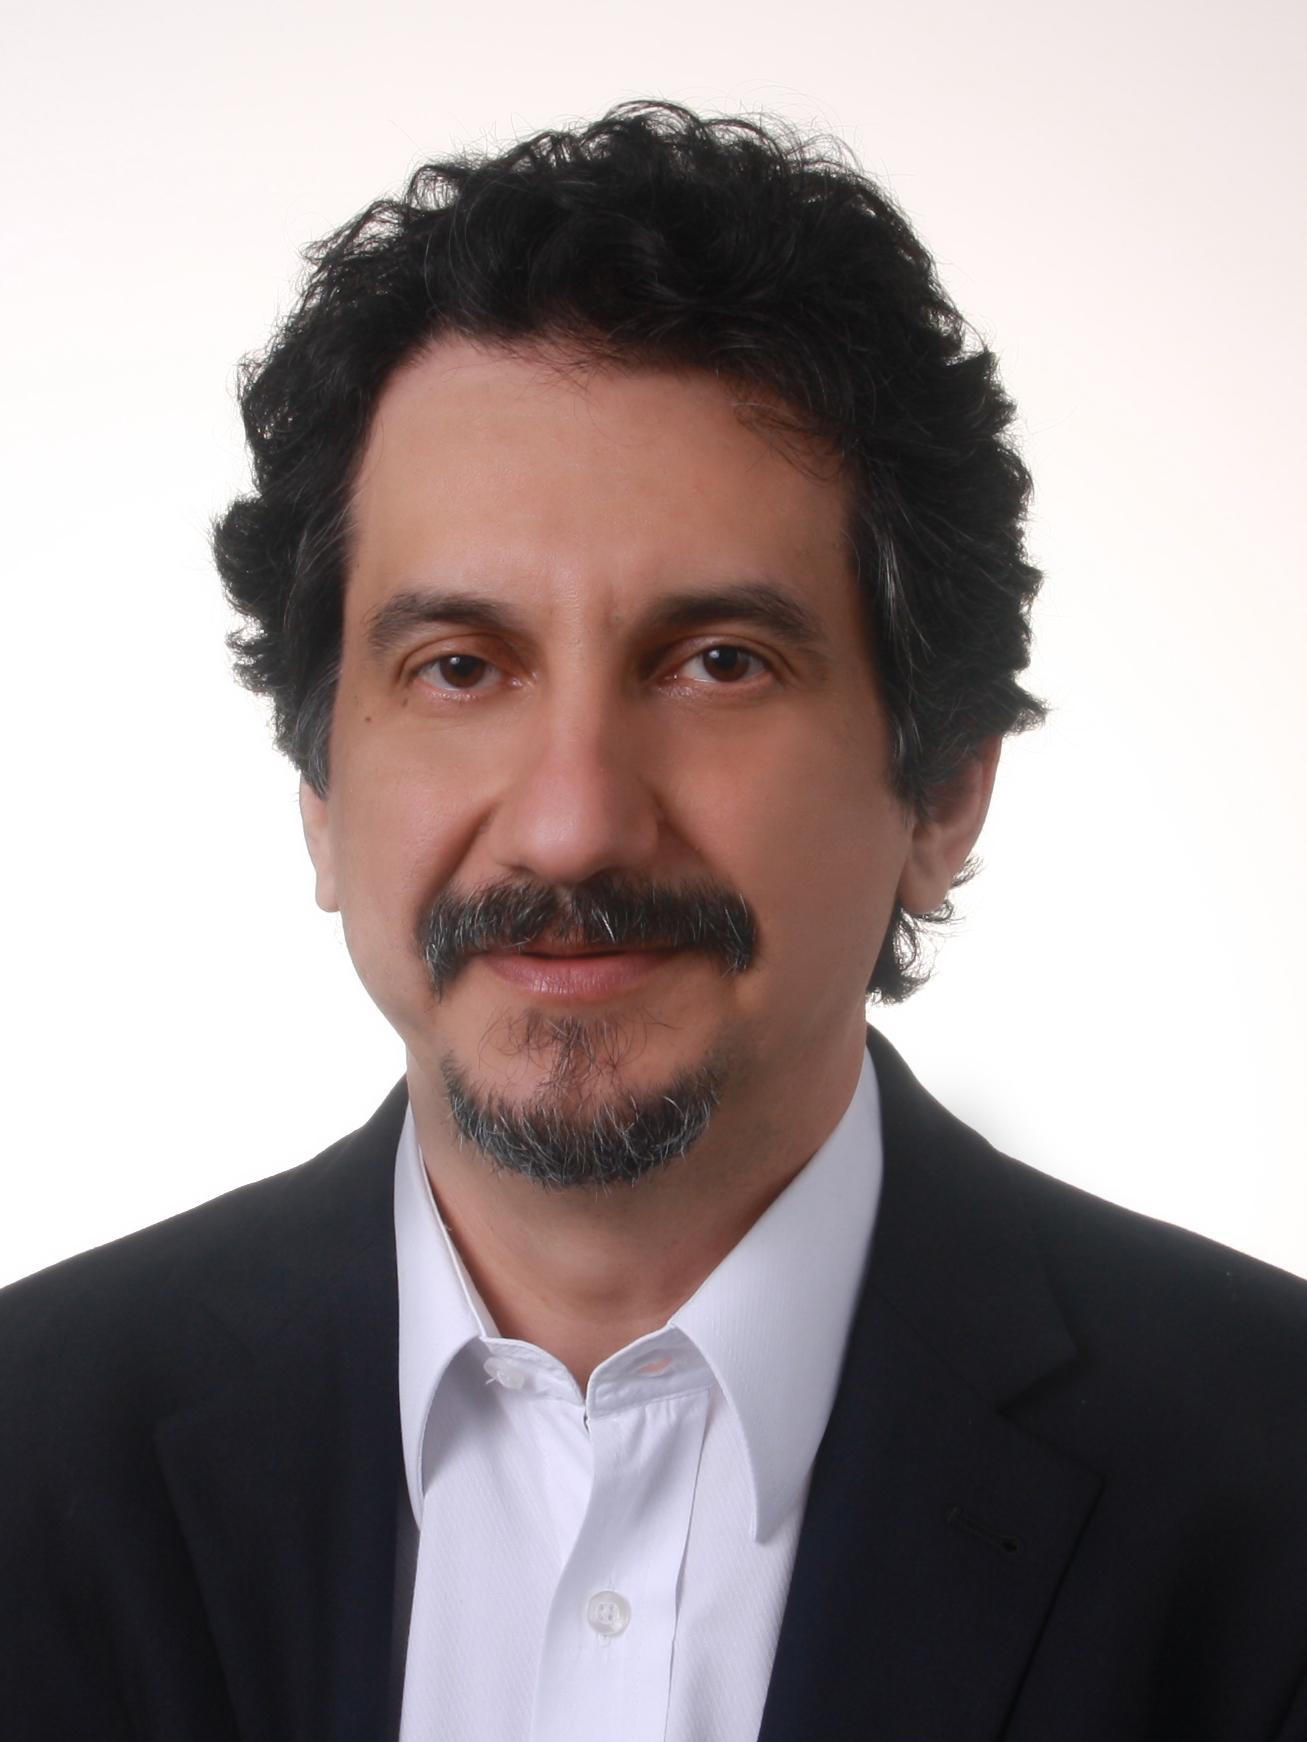 Dr. Rubens Siqueira